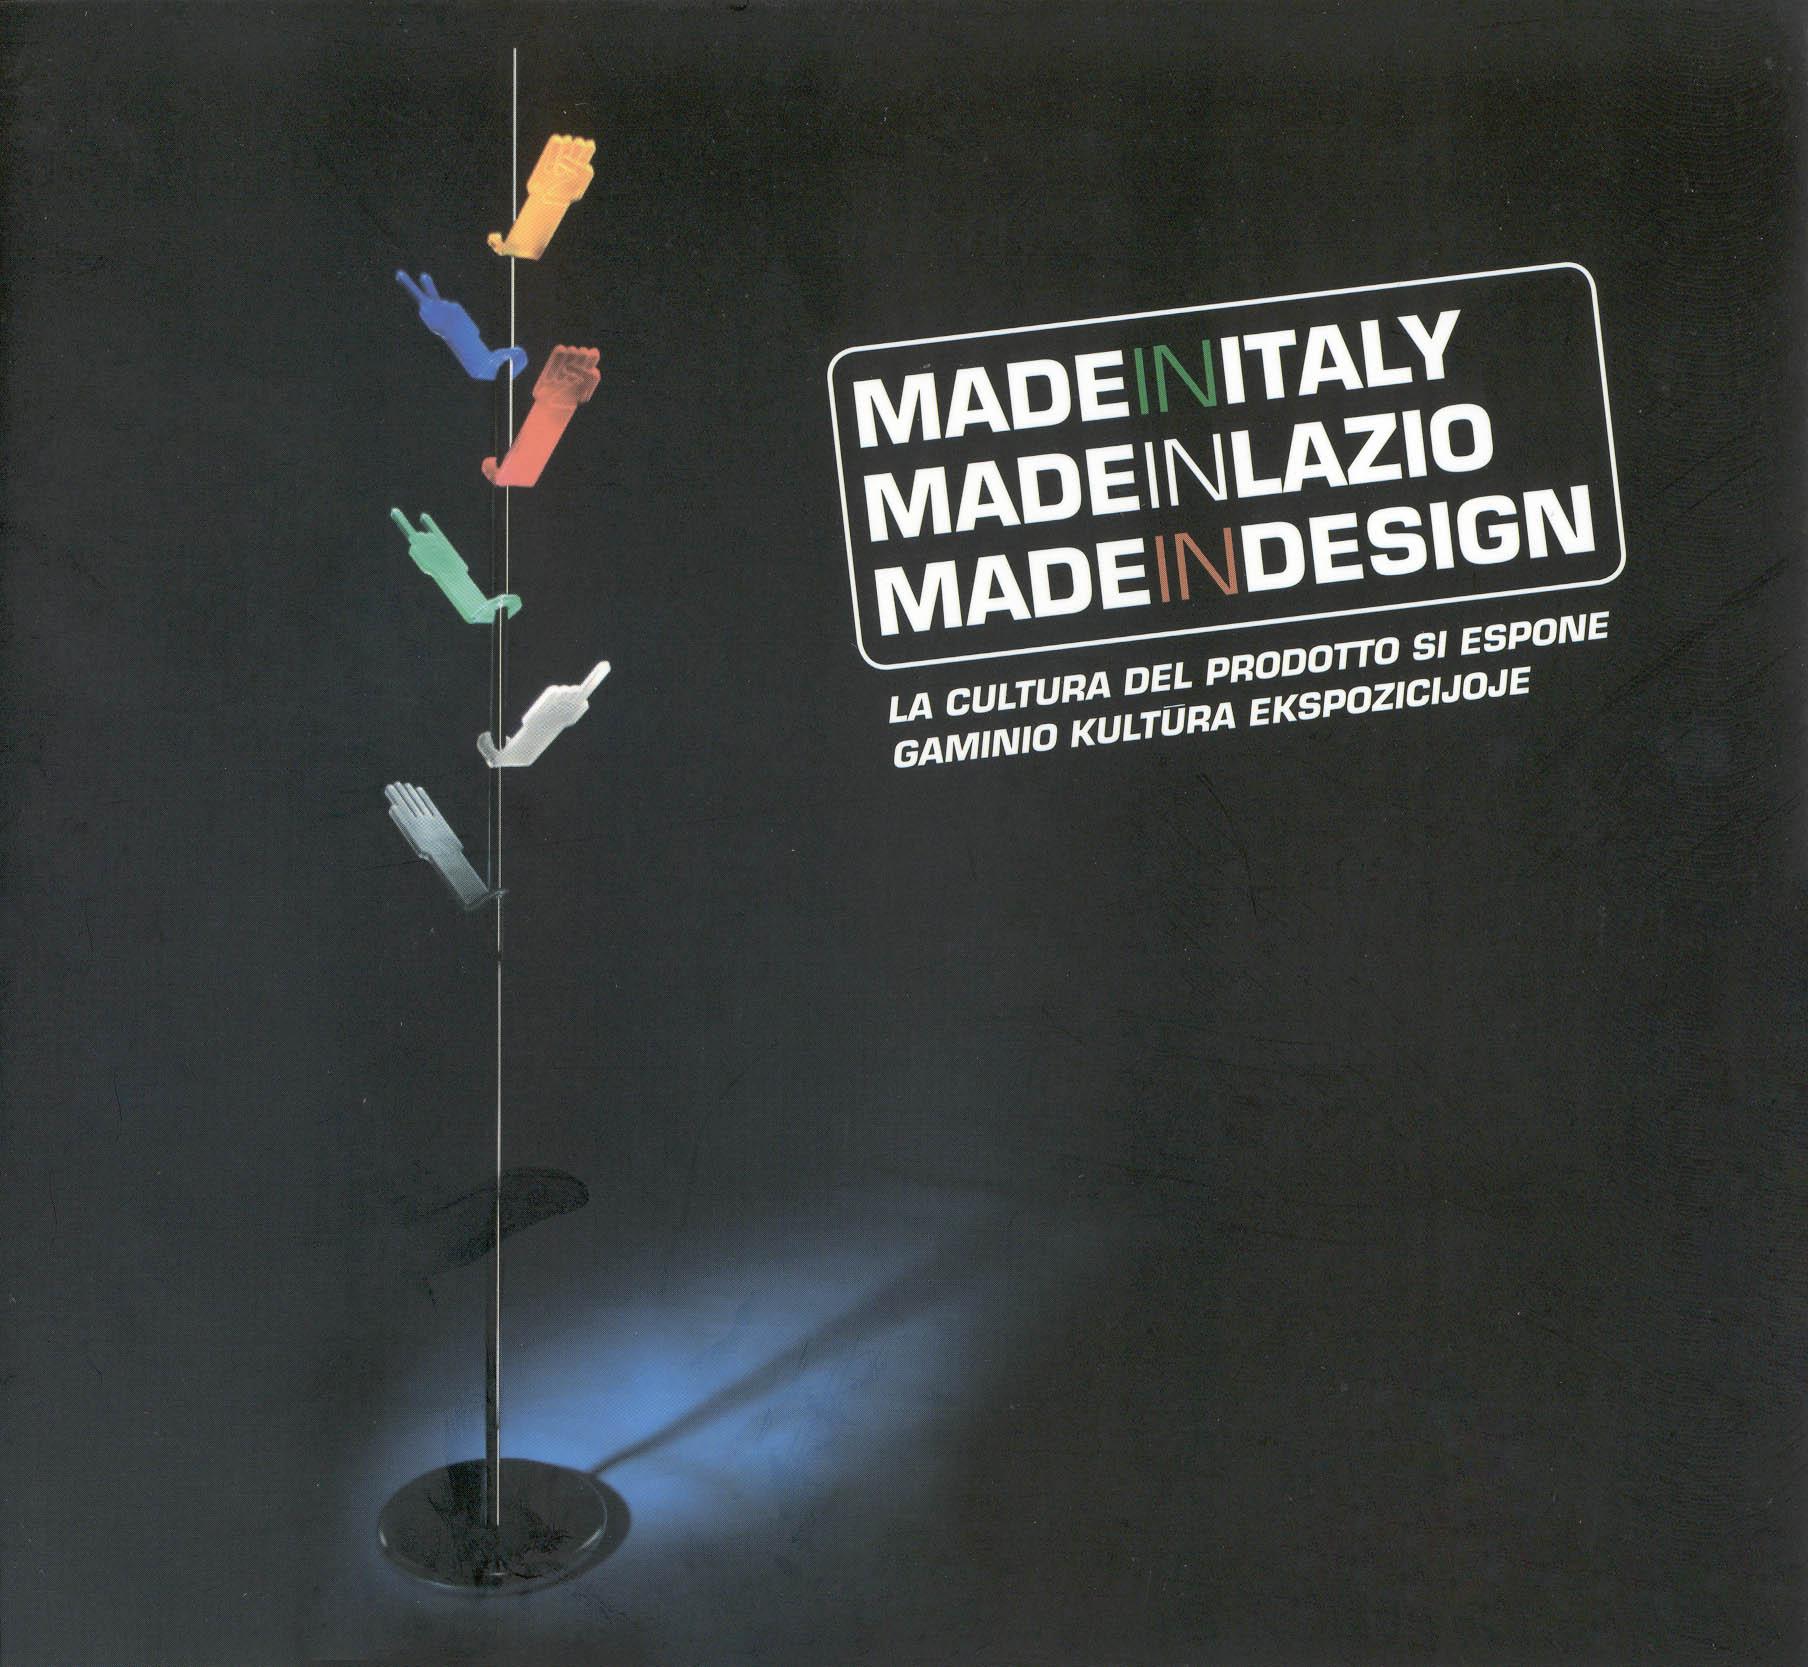 AA.VV. (2005) Made in Italy -  Made in Lazio - Made in design, Vilnius.